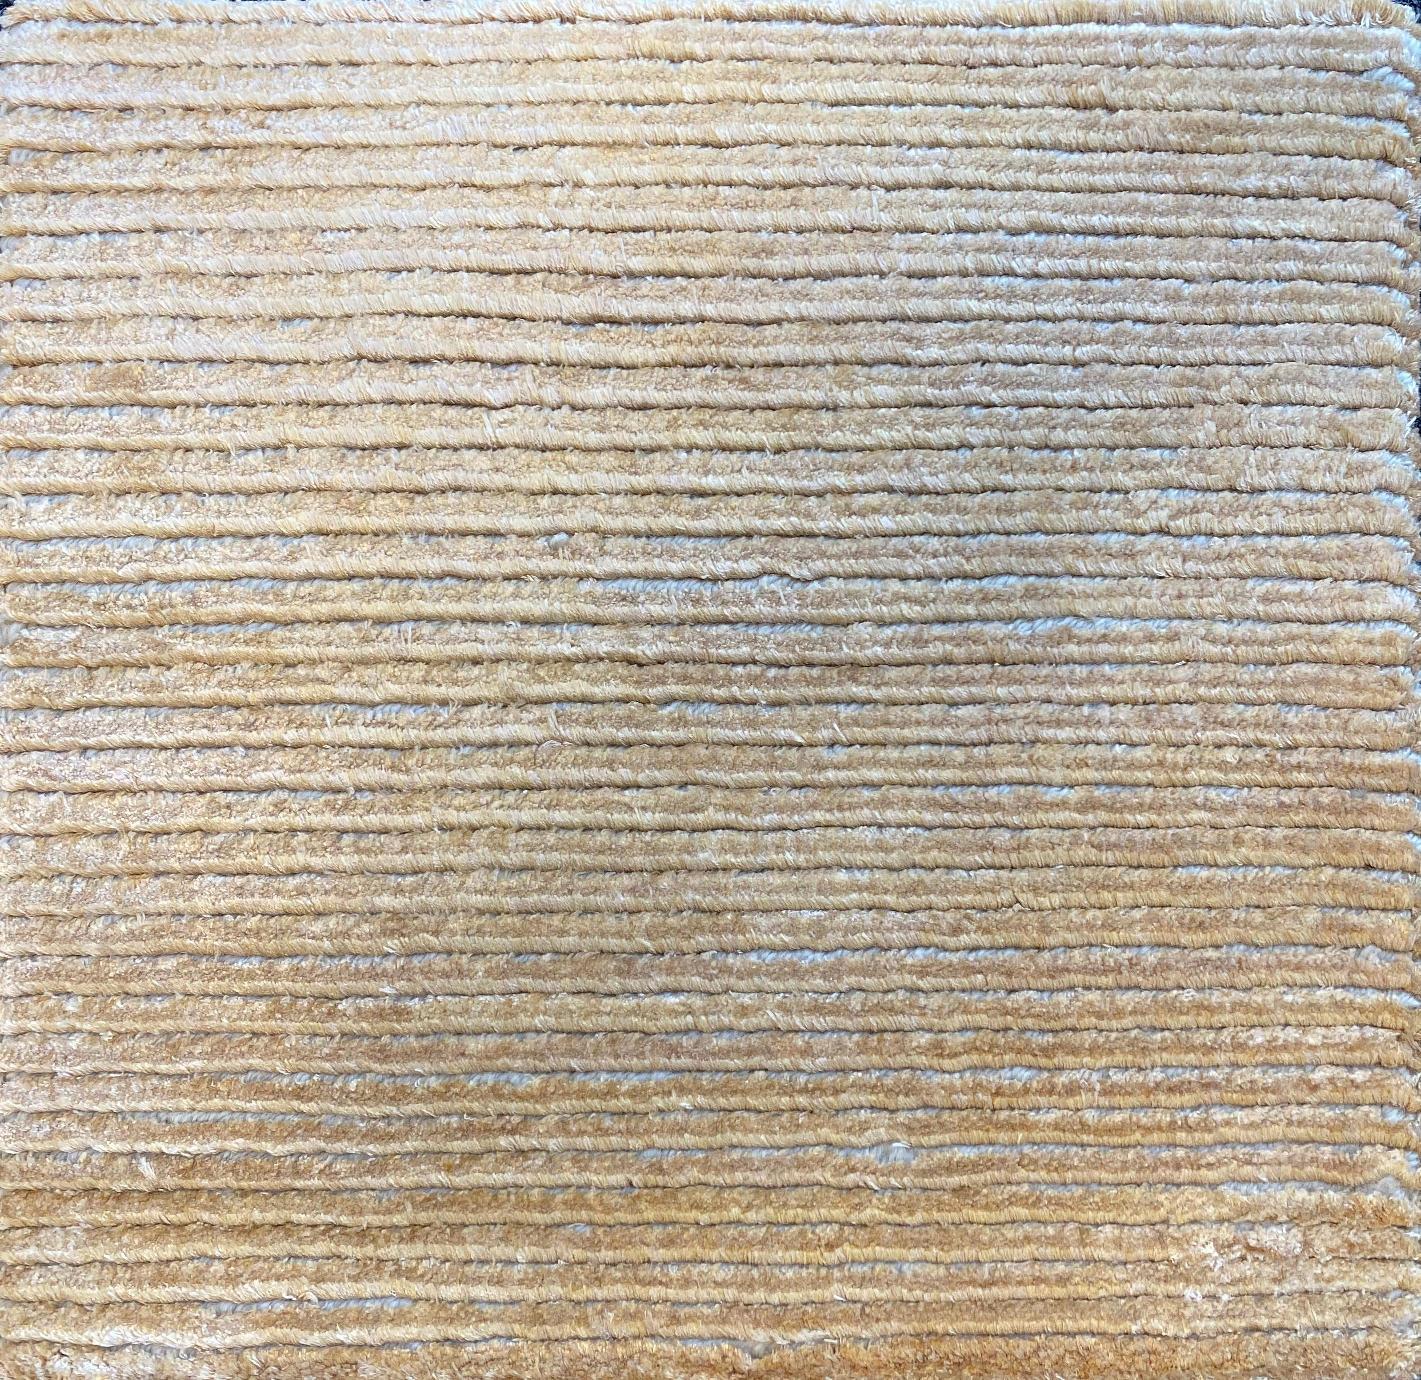 237 Silk Rows; Oro